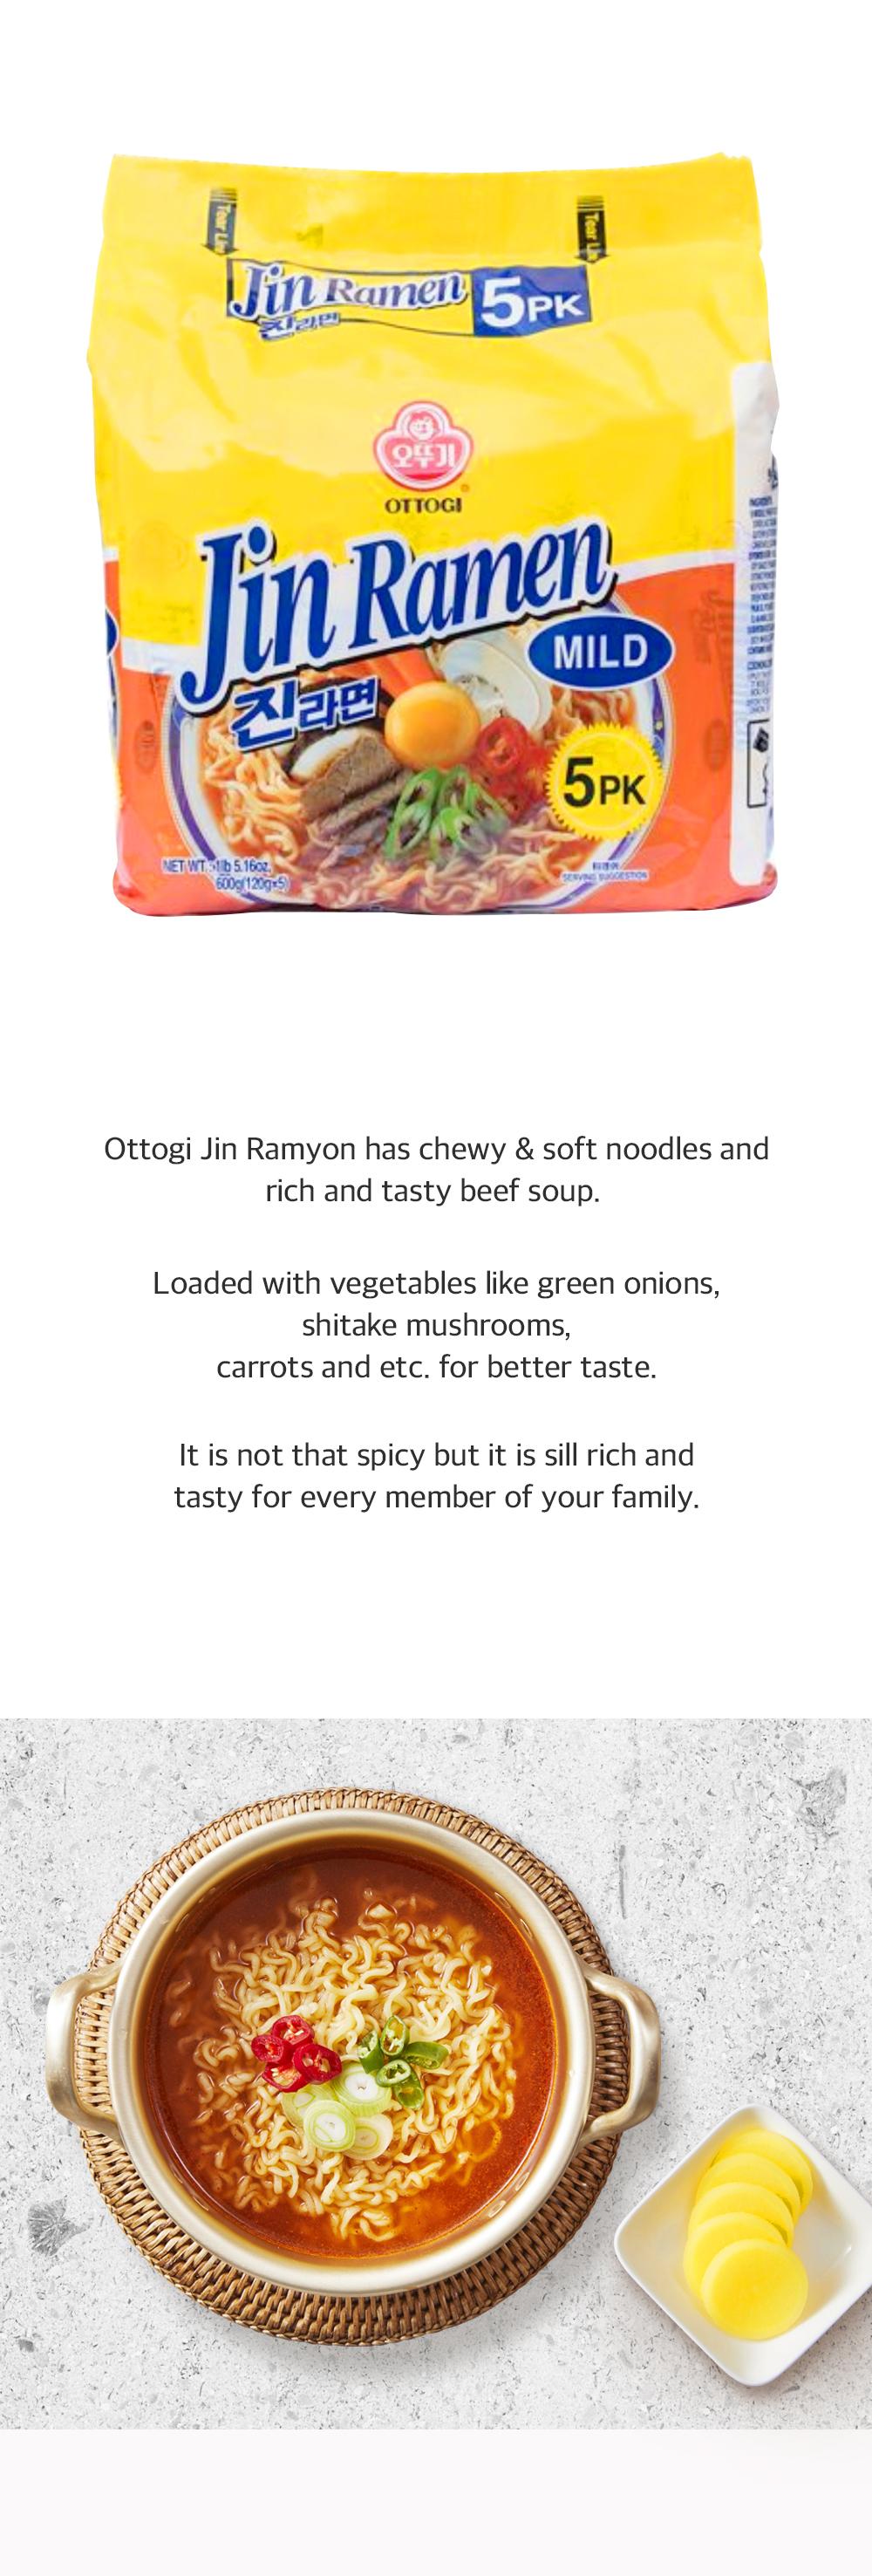 Jin Ramen Mild Flavor 4.23oz(120g) 5 Packs